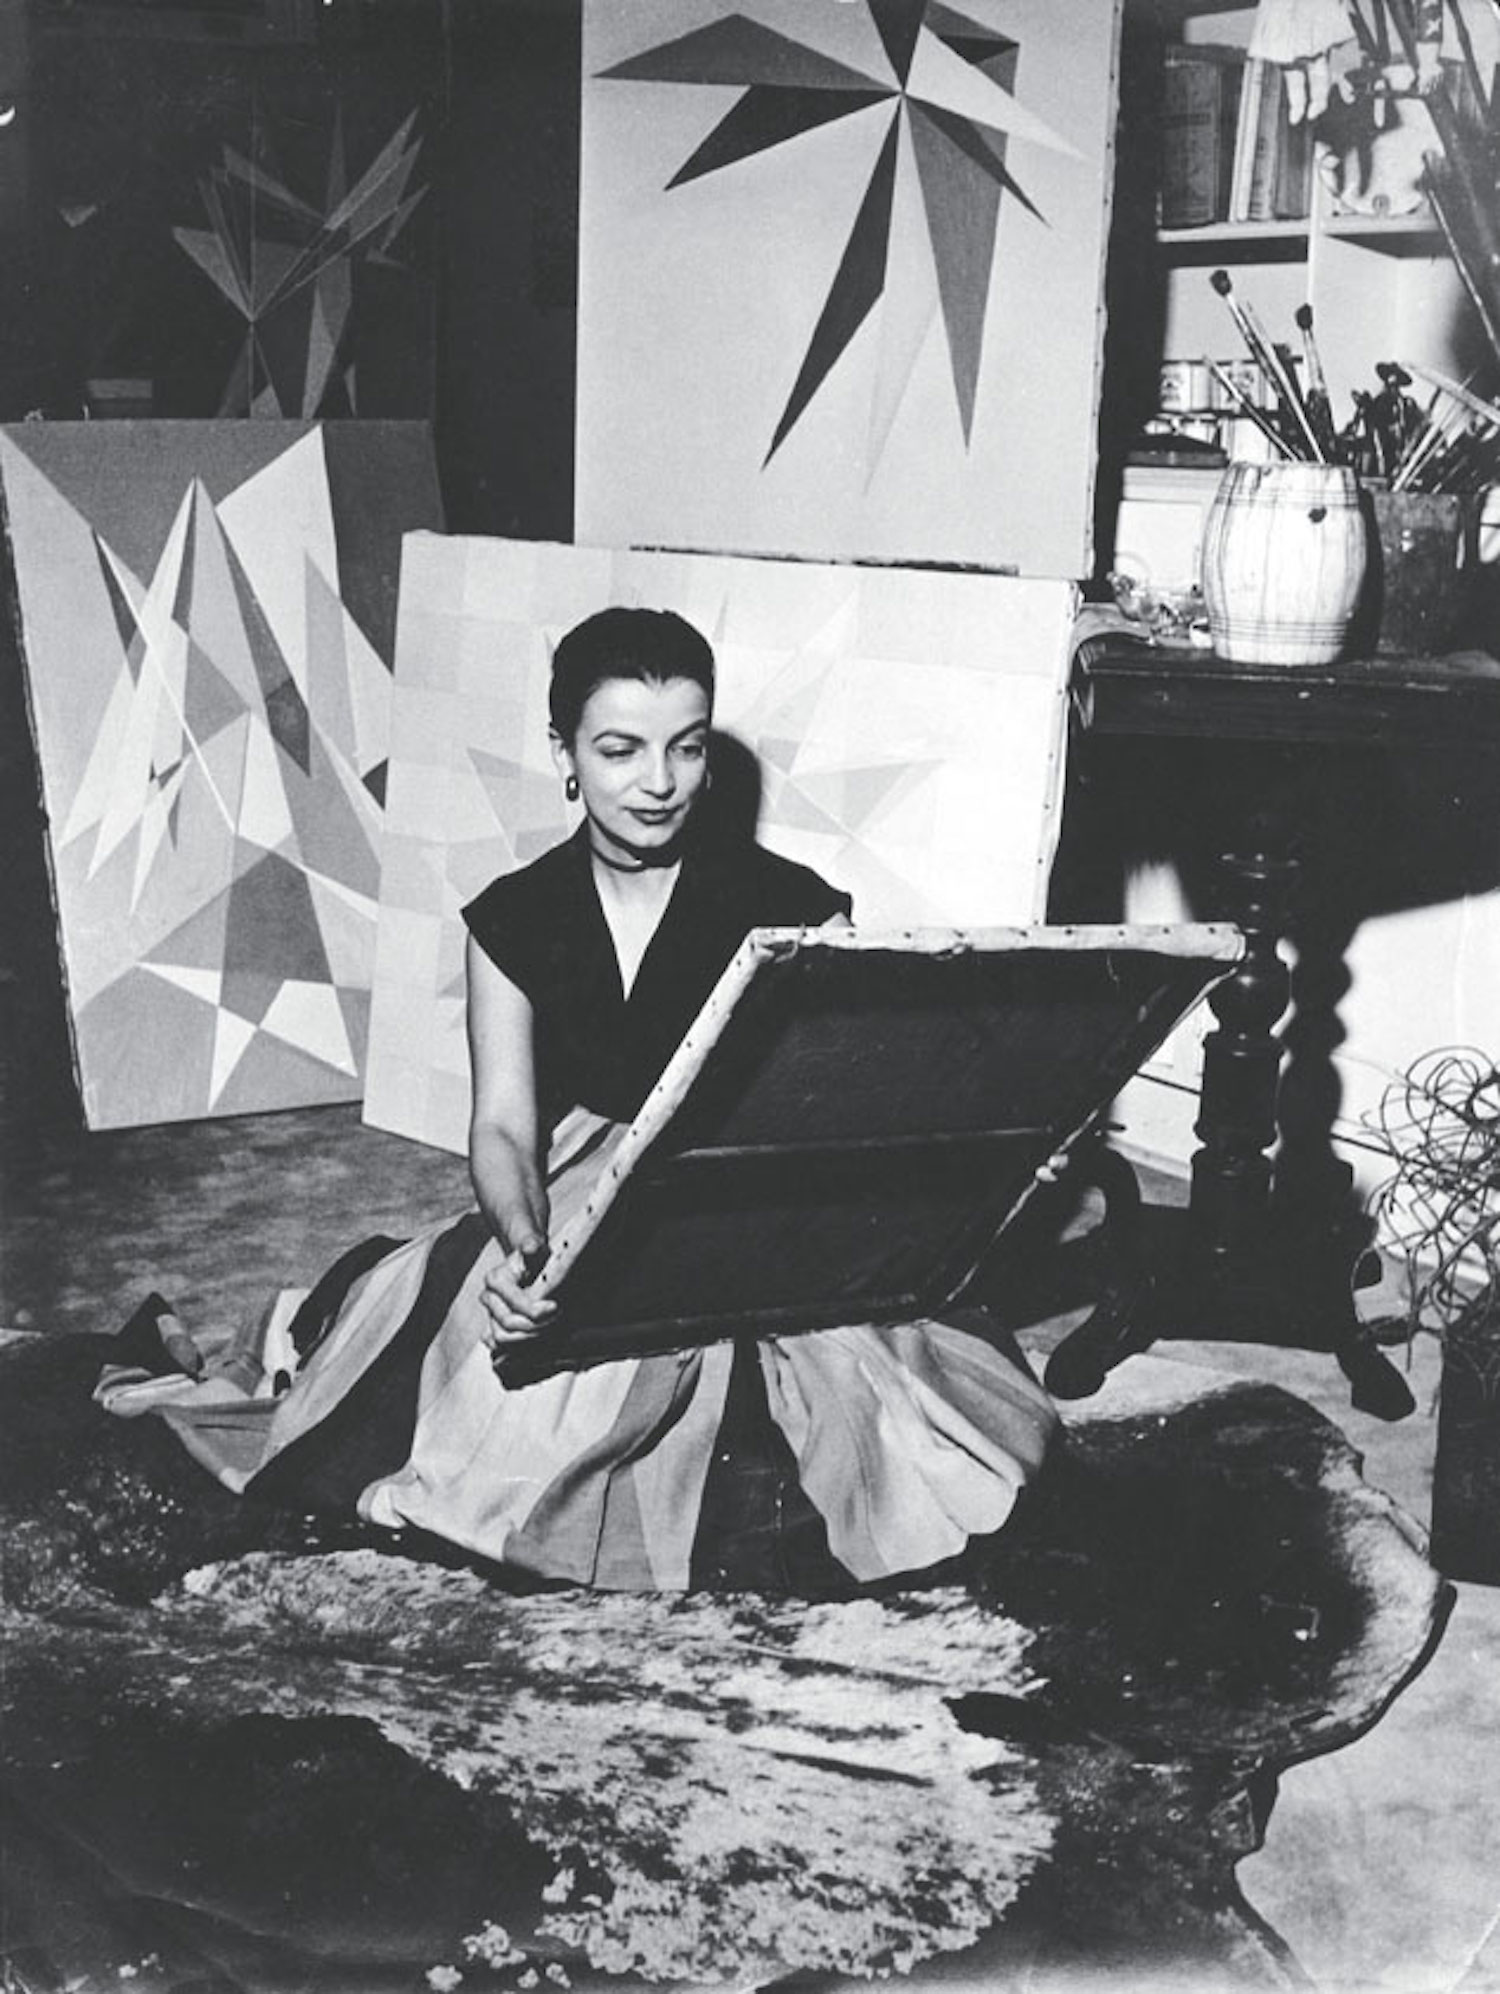 Lygia Clark in her studio, Rio de Janeiro, c. 1950Courtesy of Guggenheim Bilbao